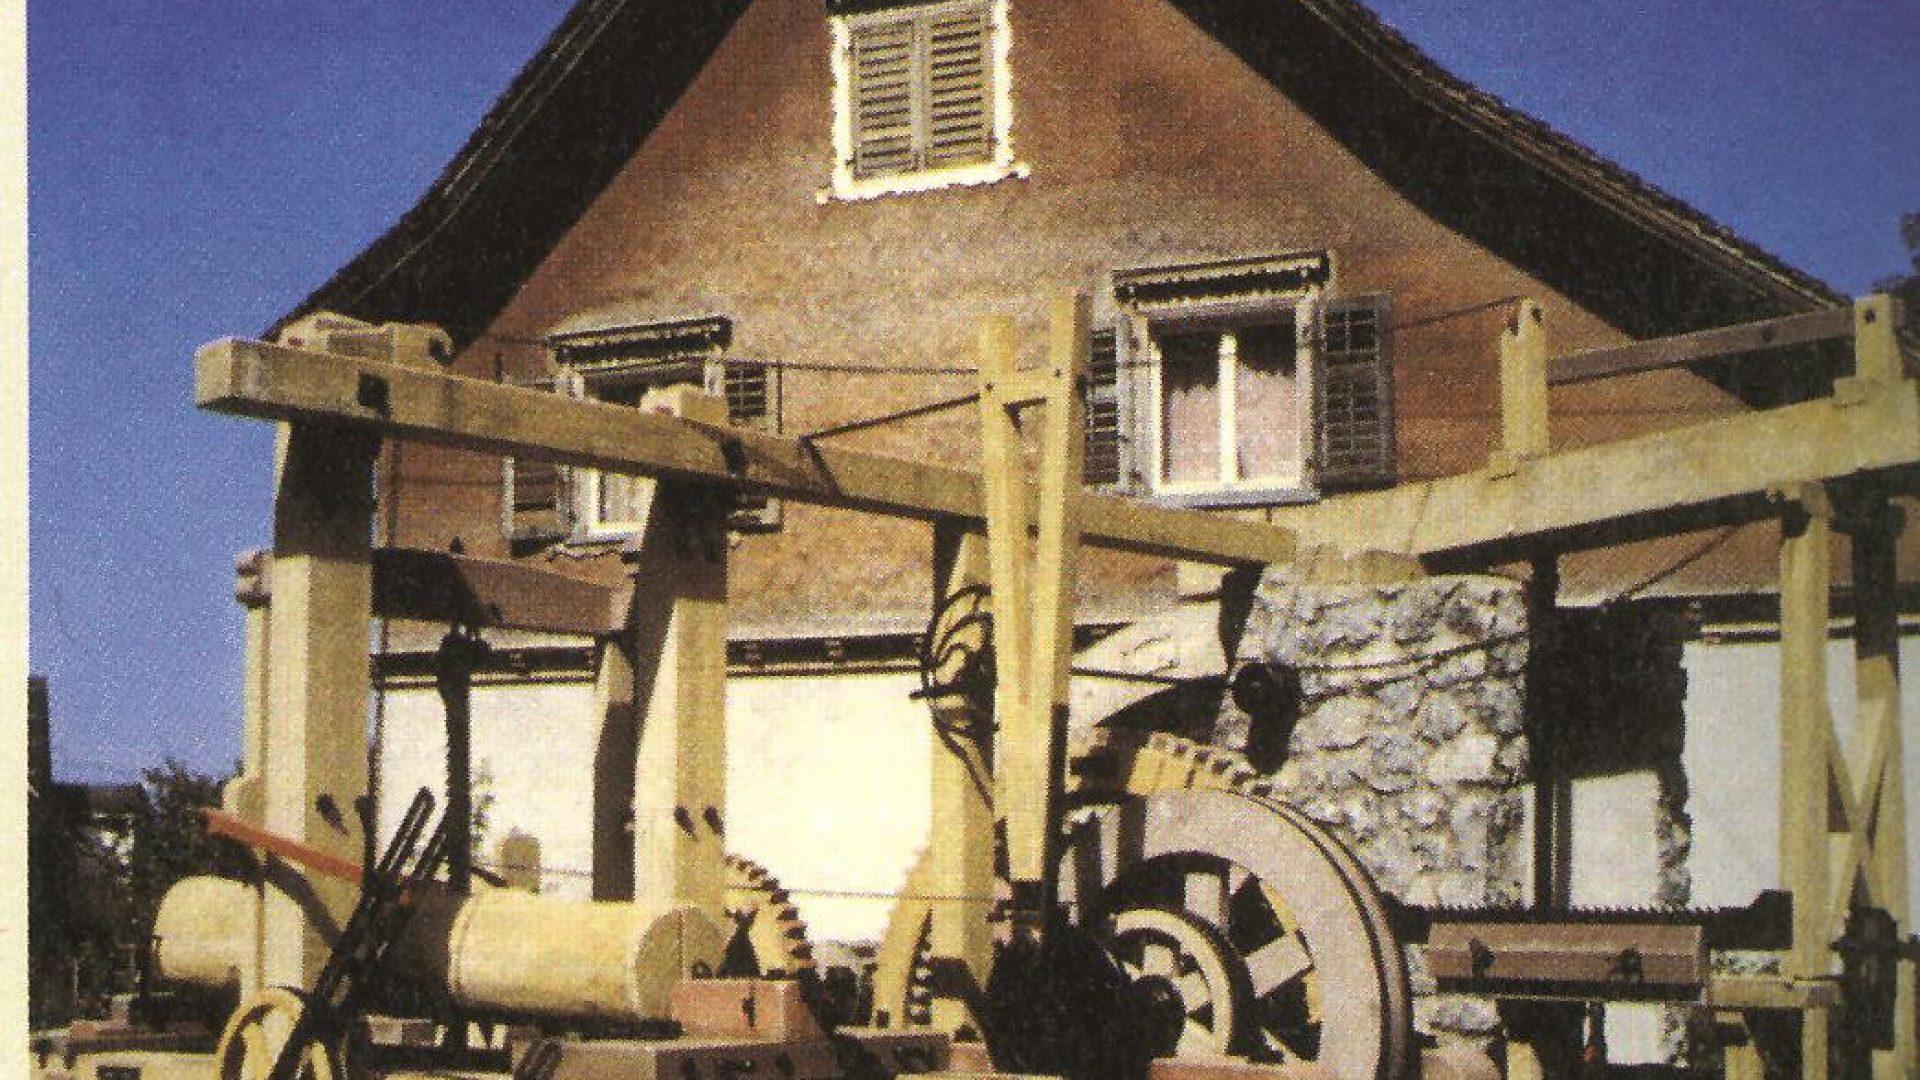 Museum Stoffels Säge-Mühle Hohenems